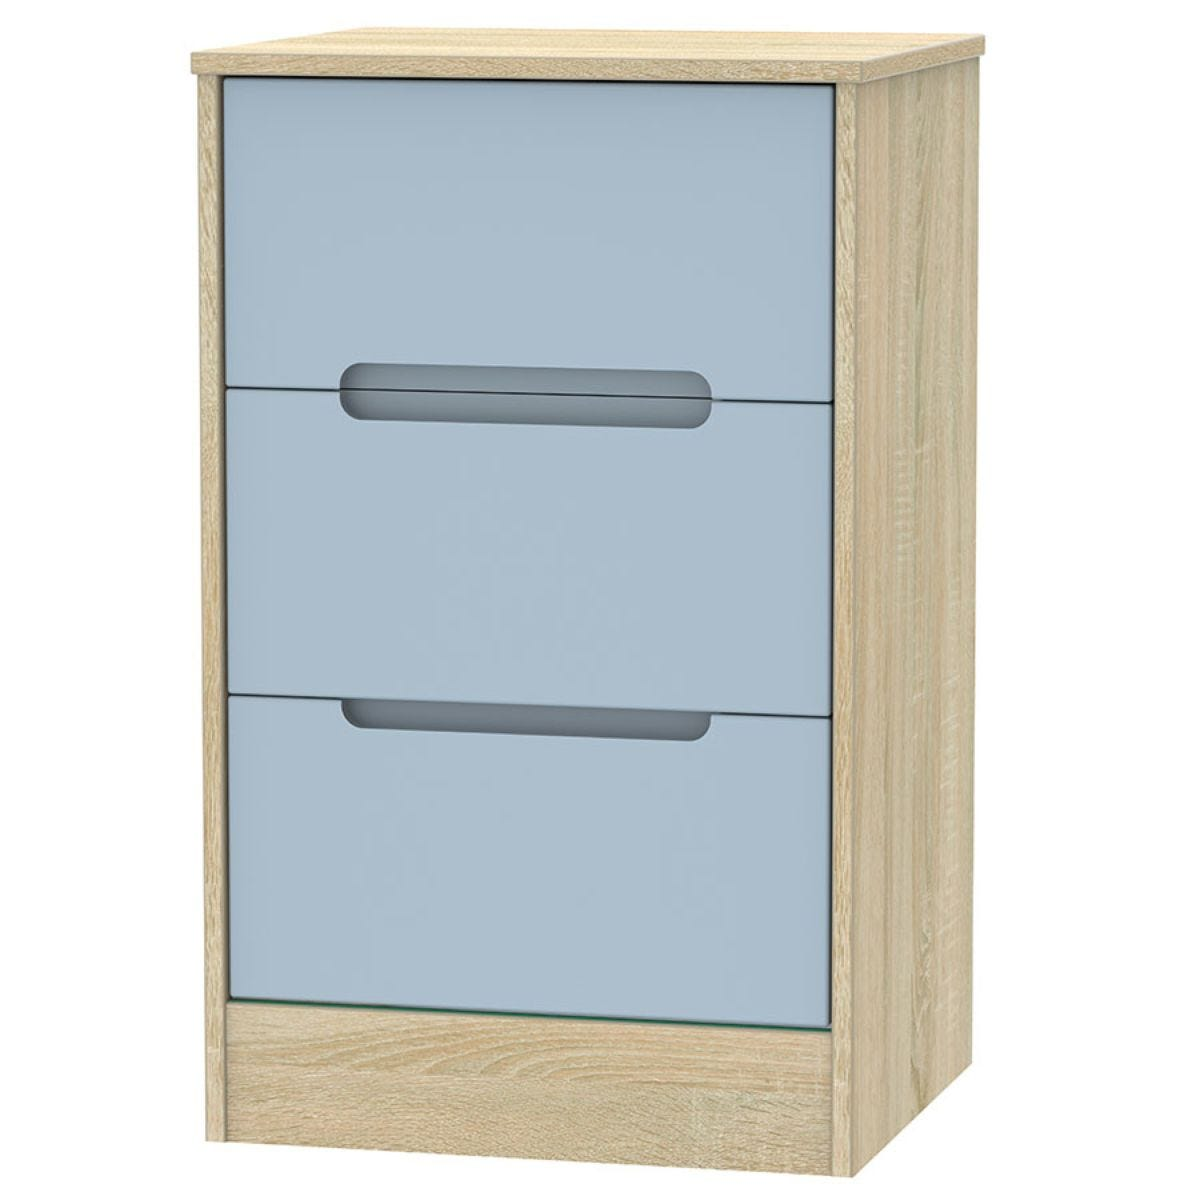 Barquero 3-Drawer Bedside Table - Pine/Denim